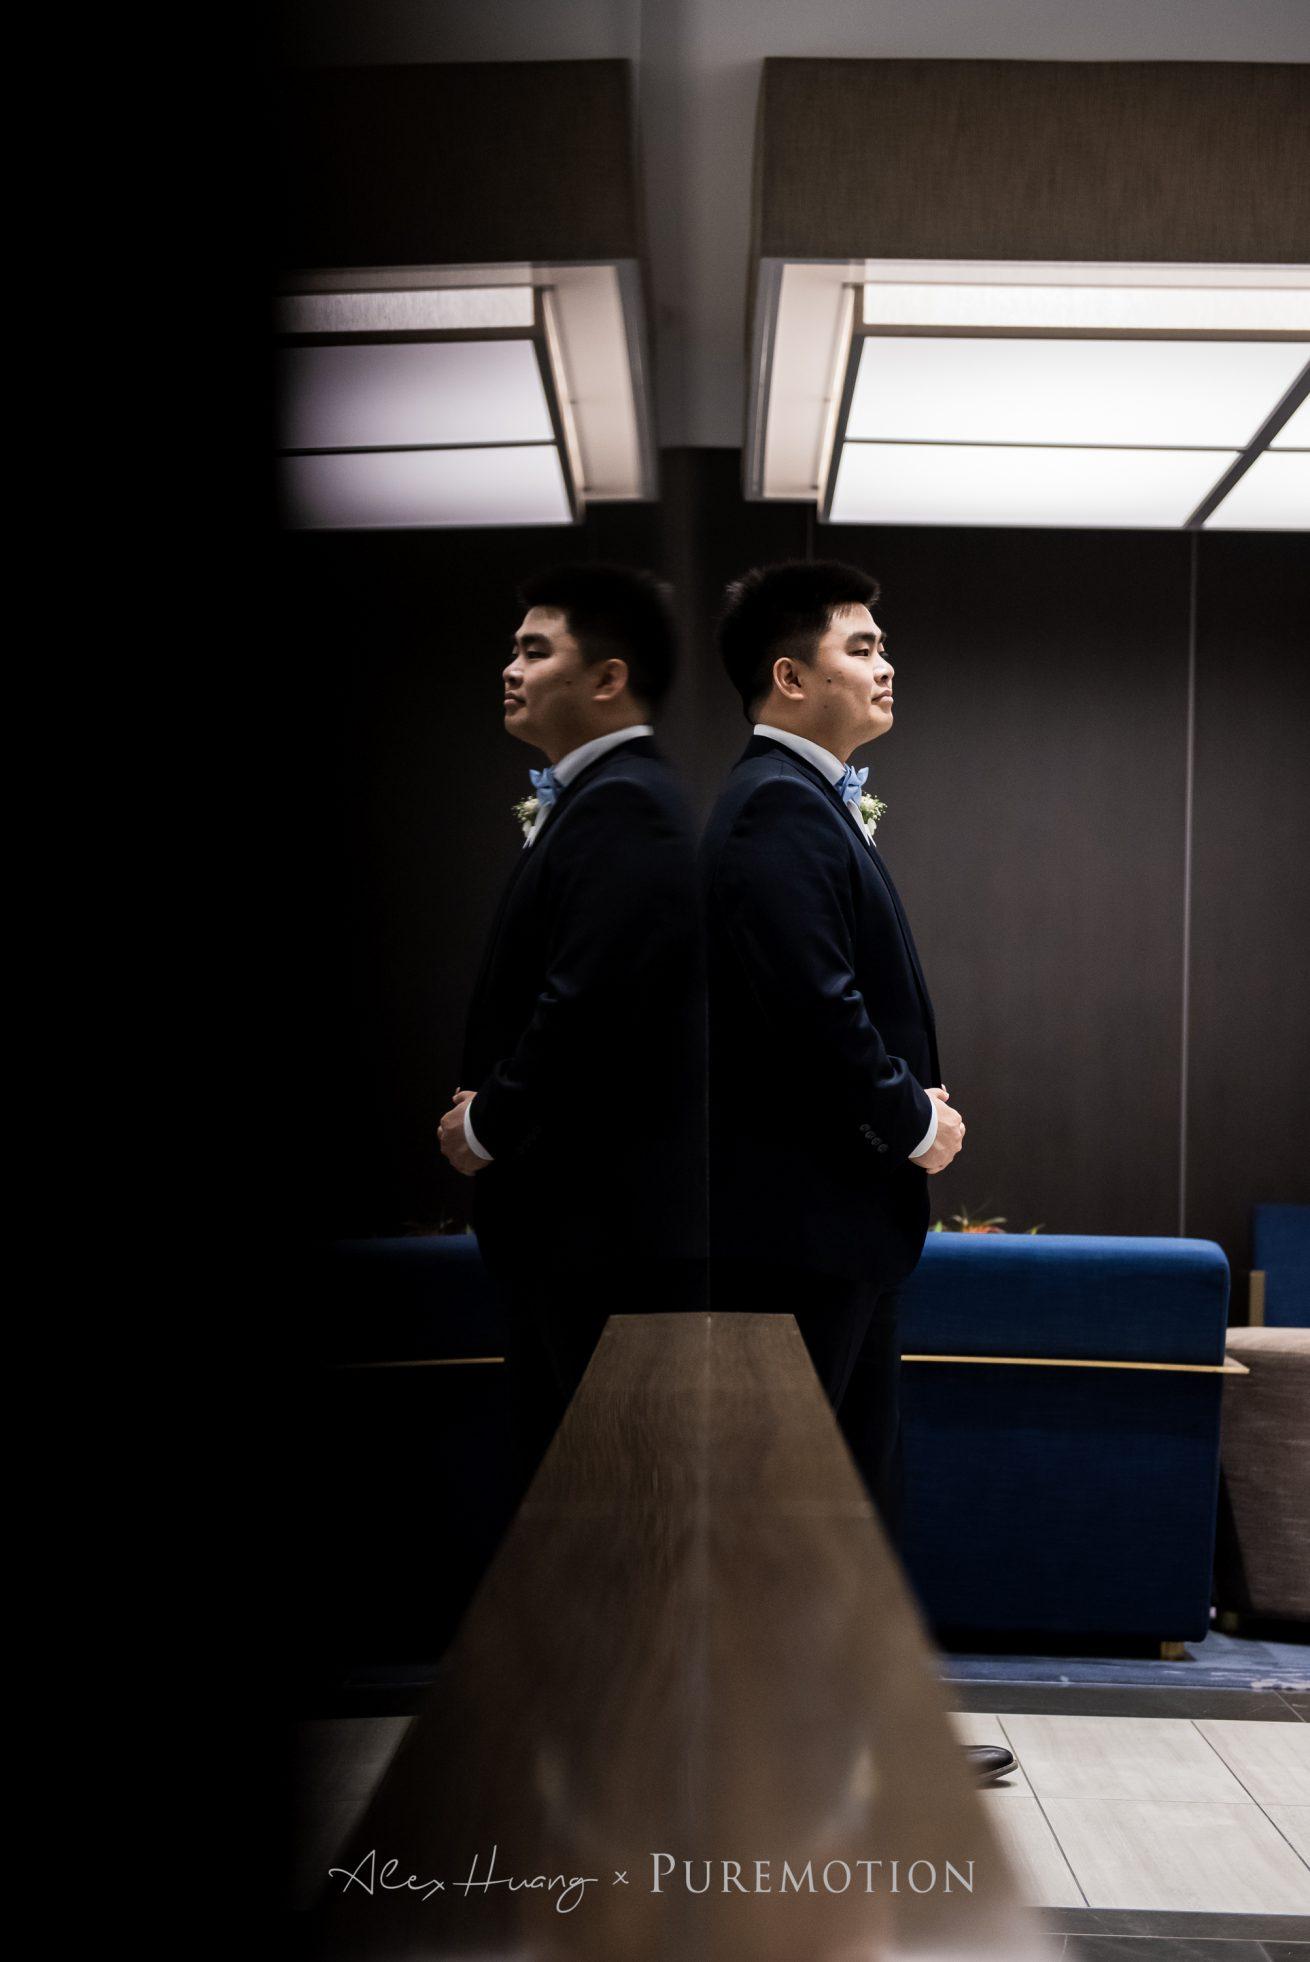 181103 Puremotion Wedding Photography Alex Huang StephBen-0086